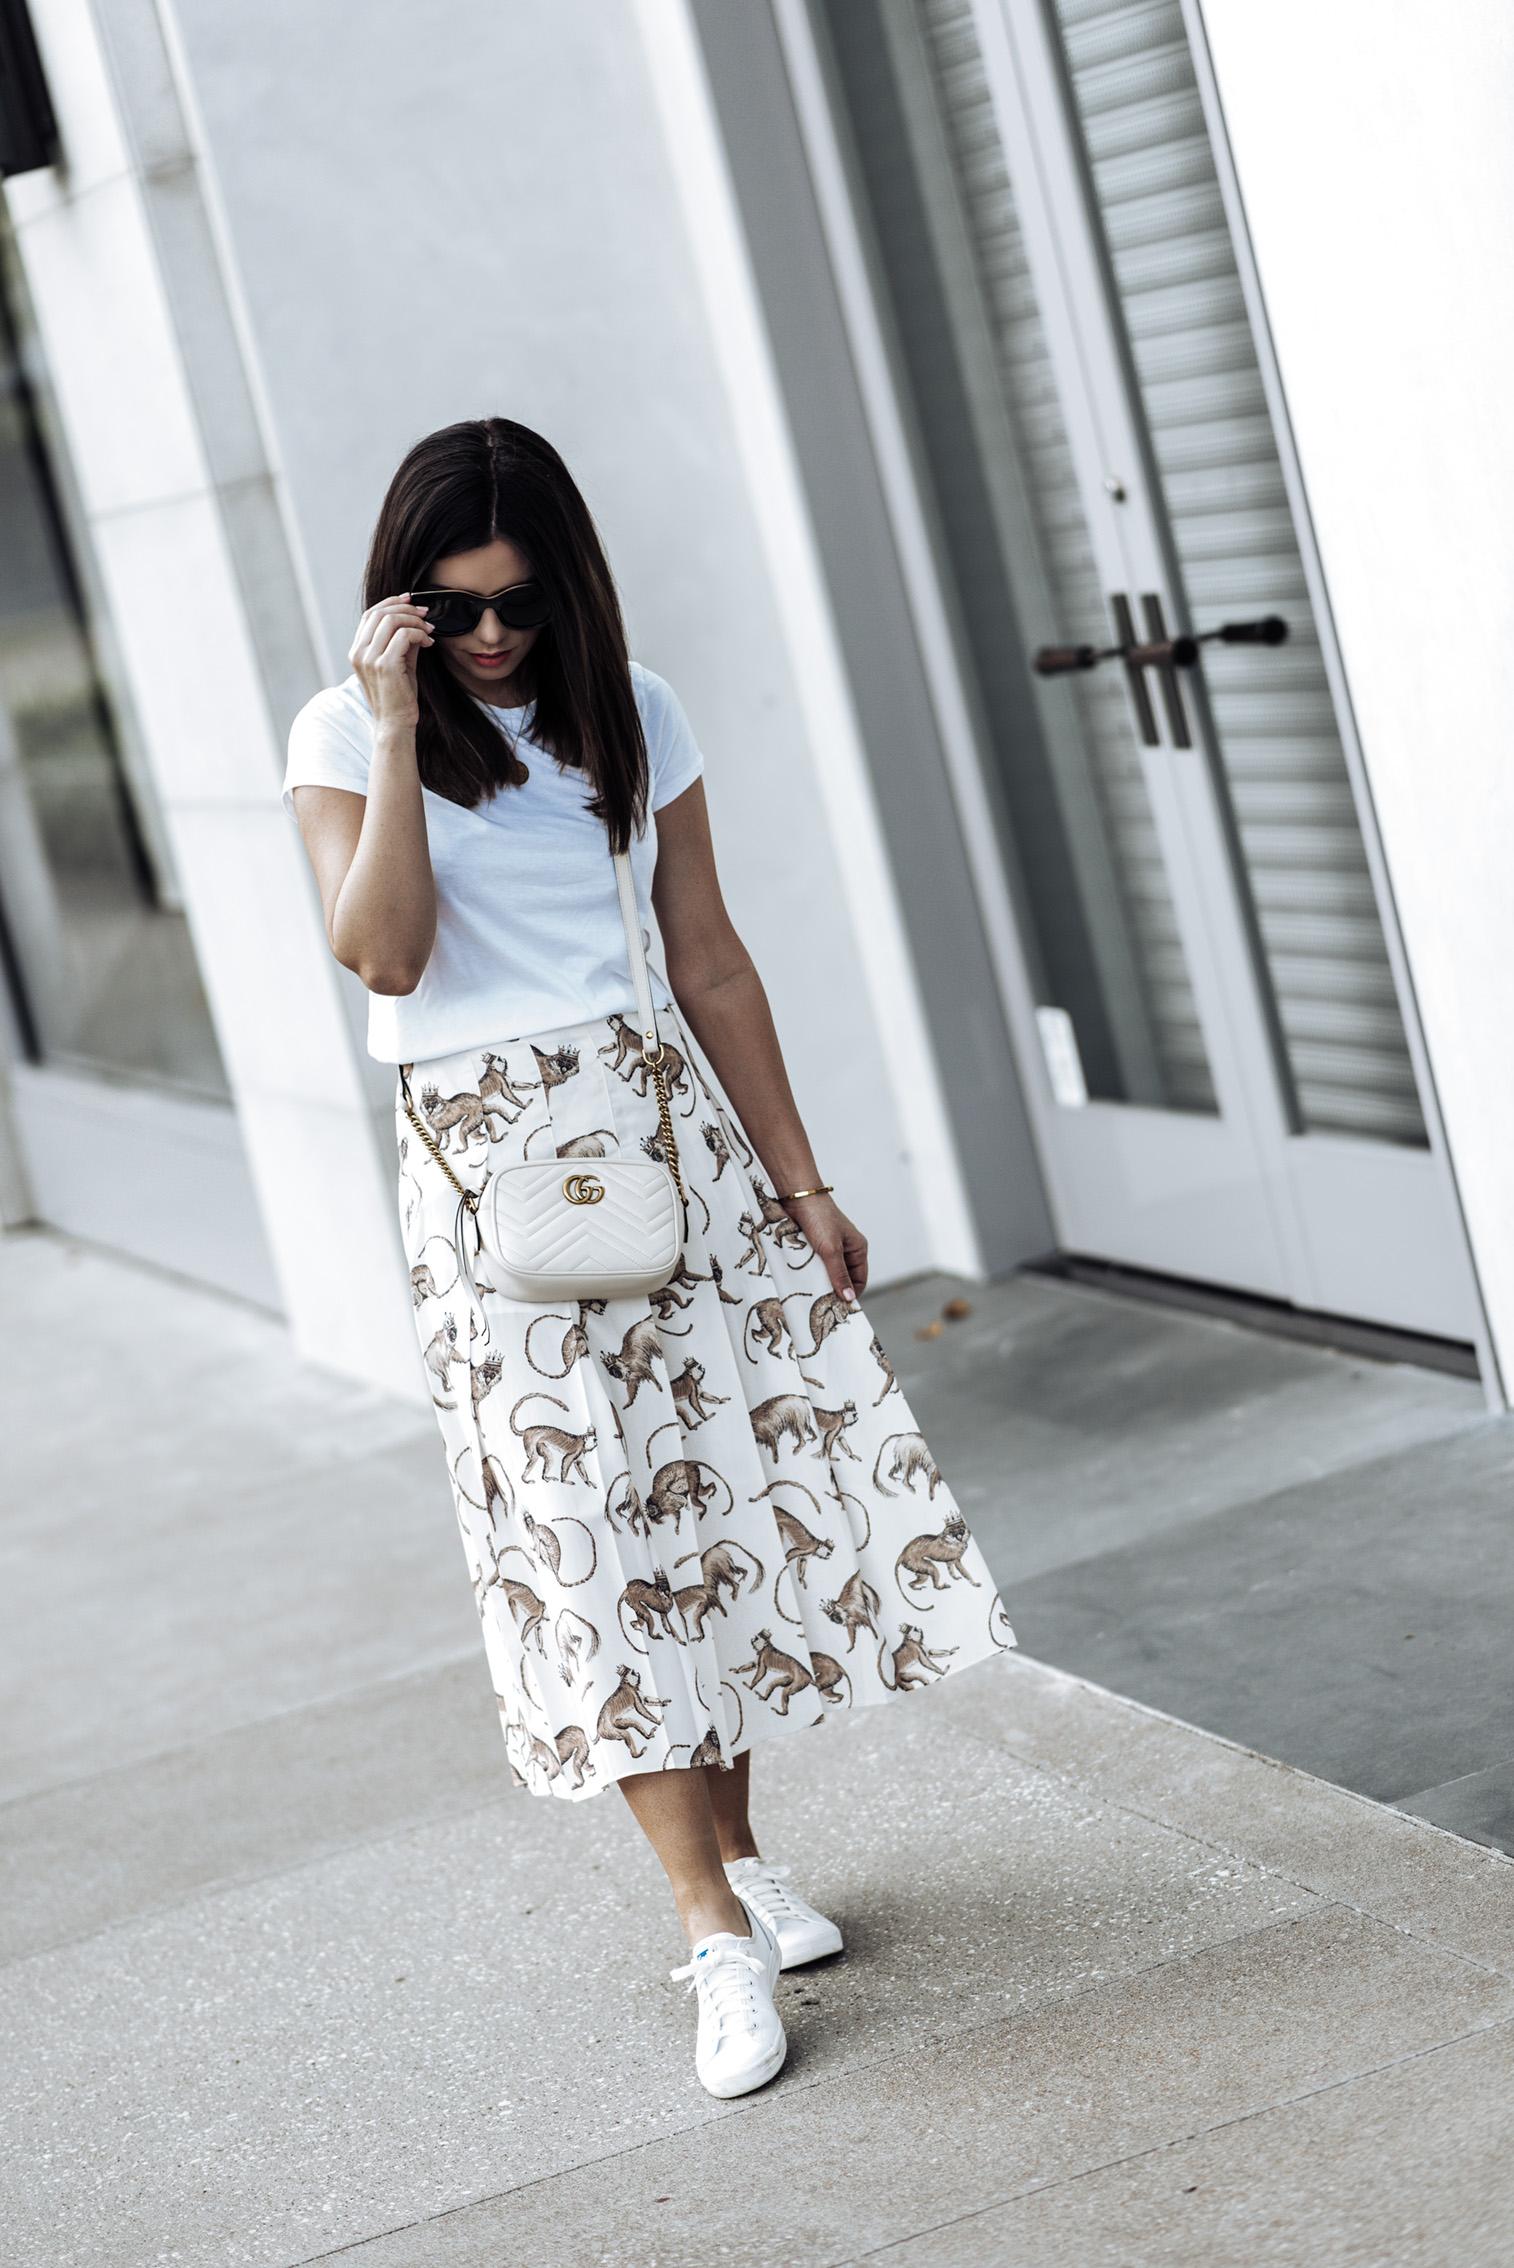 Tiffany Jais fashion and lifestyle blogger of Flaunt and Center | Monkey Print | Houston fashion blogger | Printed monkey skirt H&M | White Cotton Tee | Keds Kickstart leather sneaker | Gucci Marmont in white